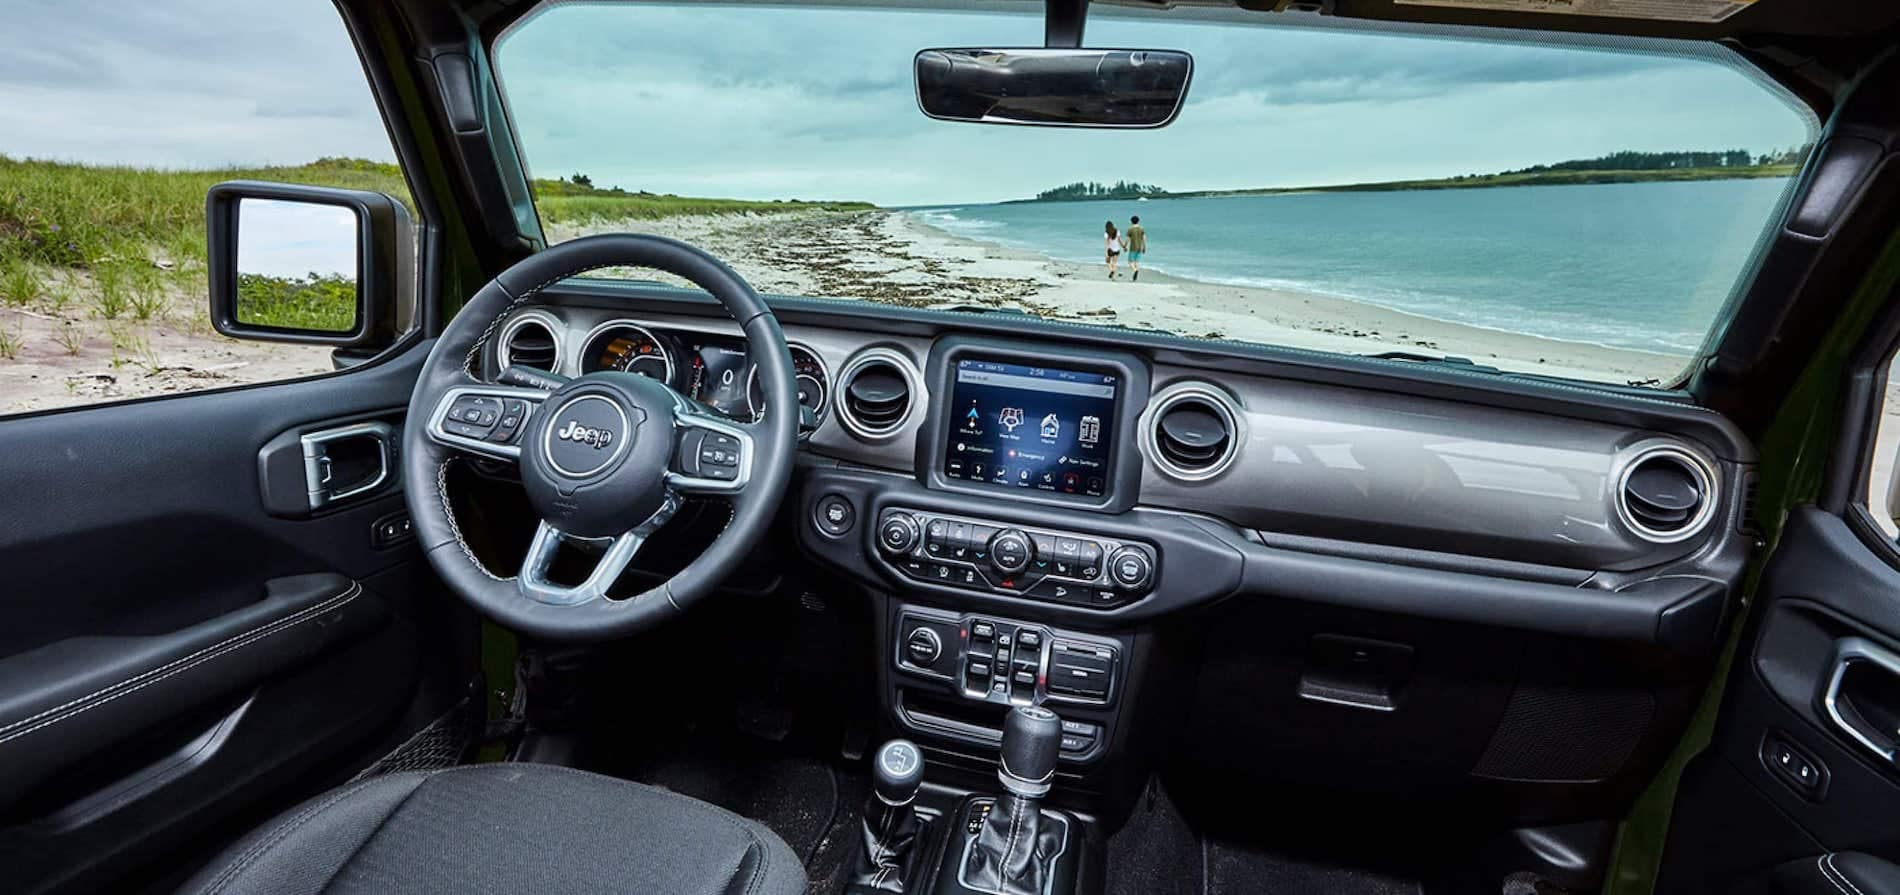 2021 Jeep Wrangler dashboard